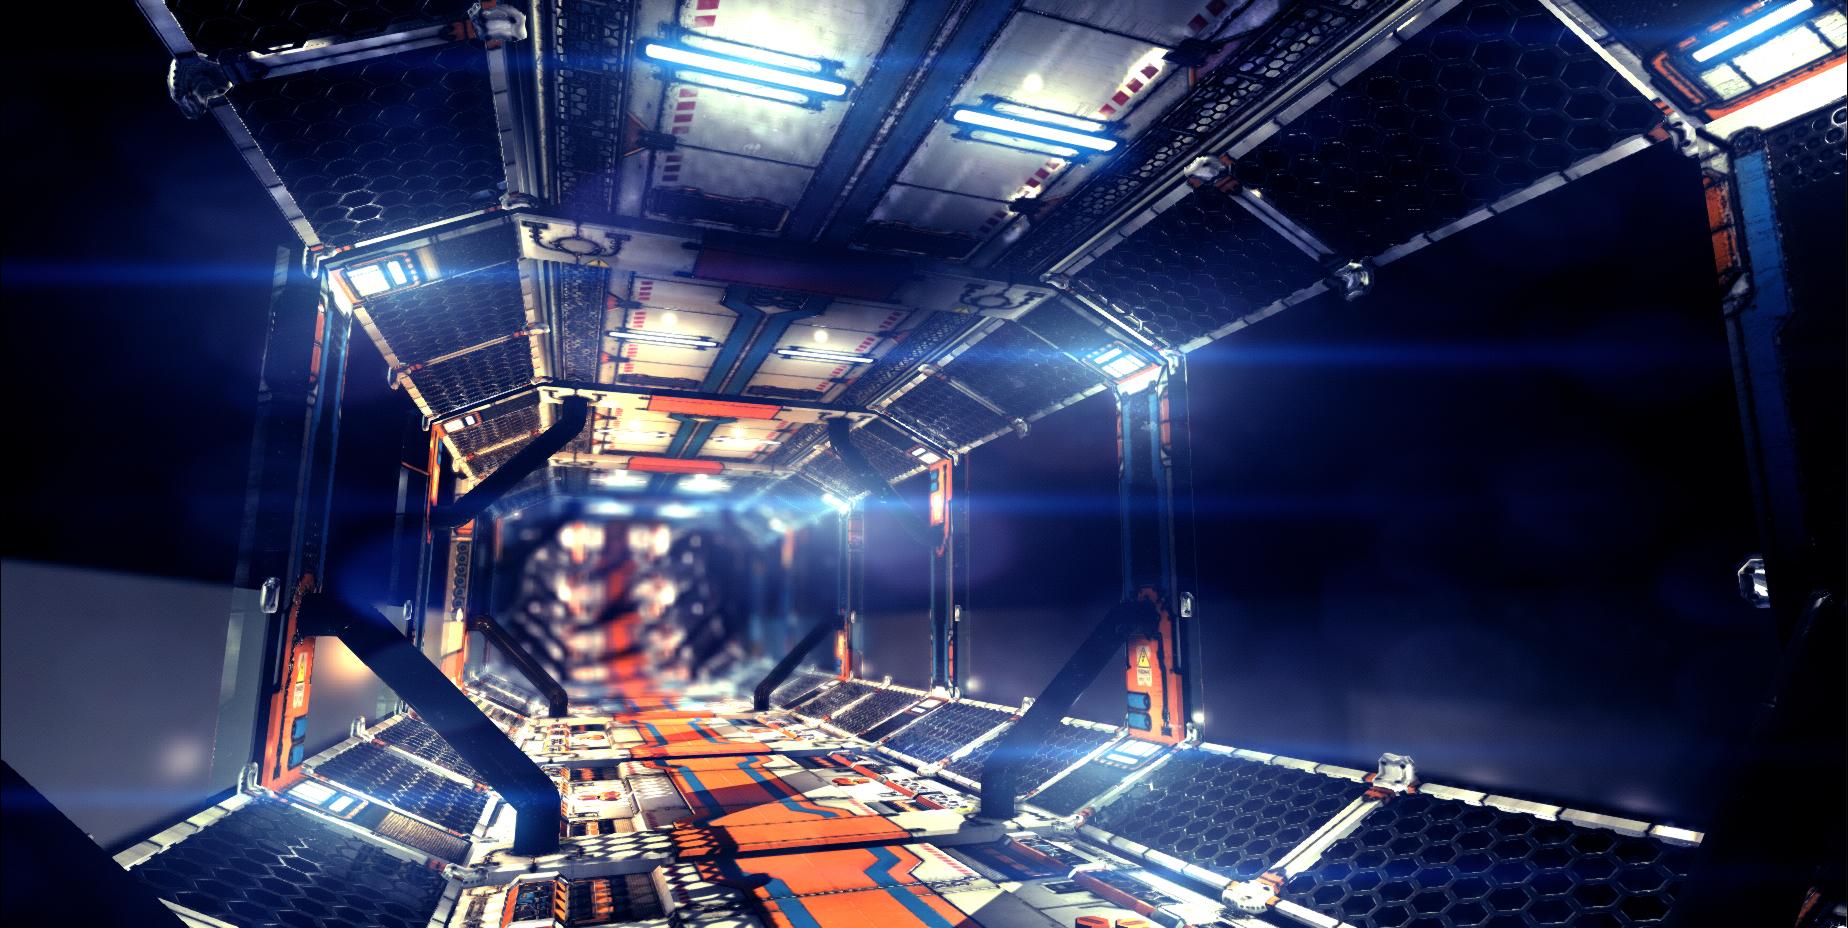 Sci Fi Corridor v2 by samdrewpictures